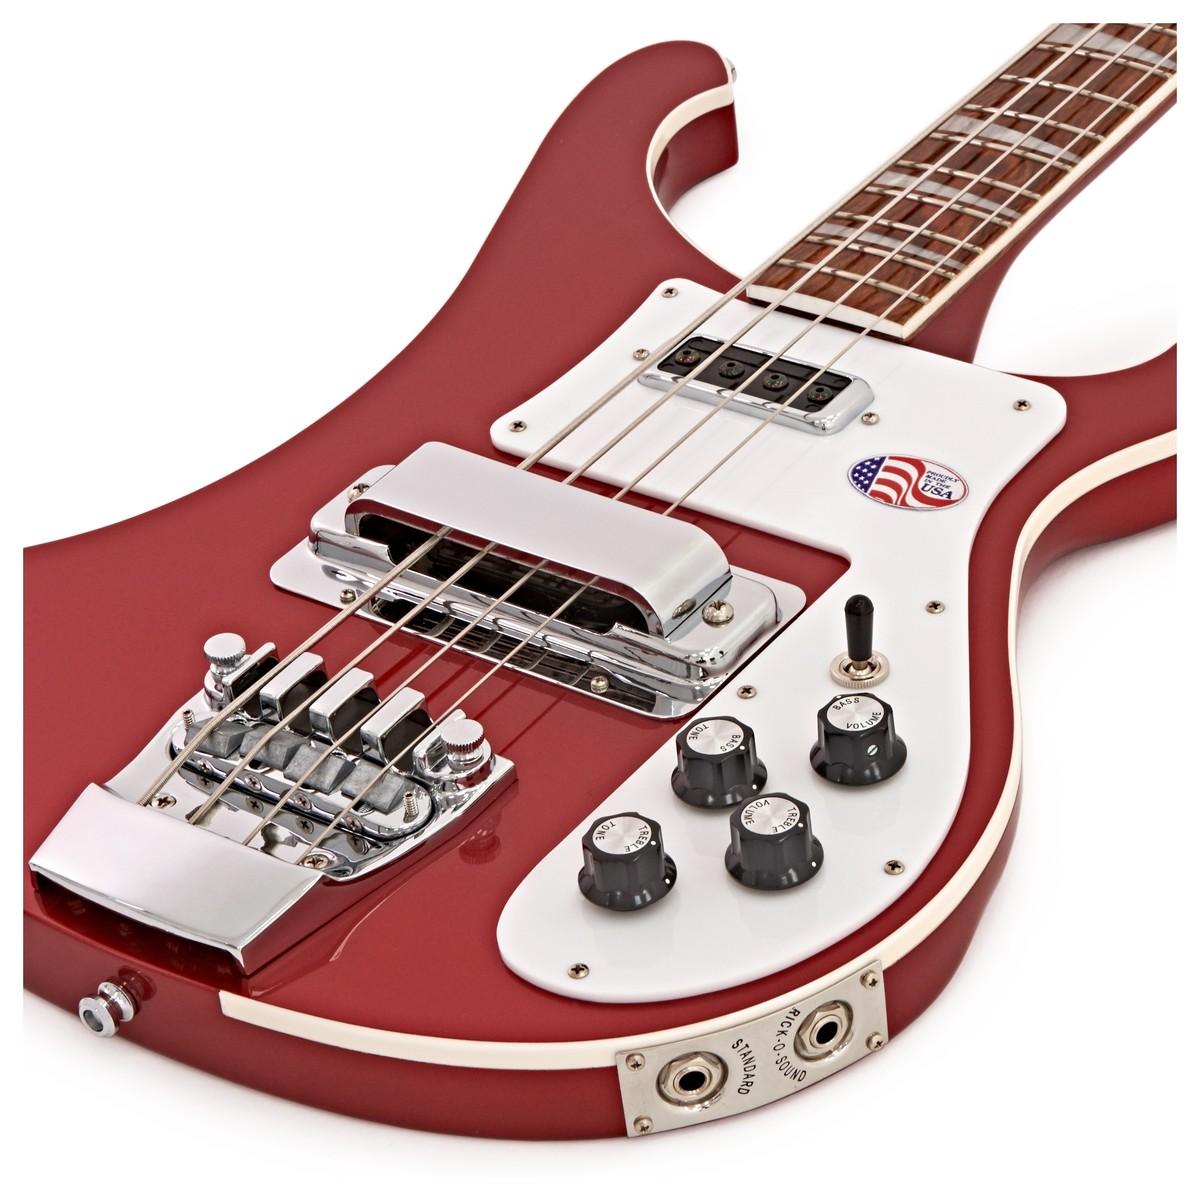 Rickenbacker 4003 Bass Guitar Ruby Red